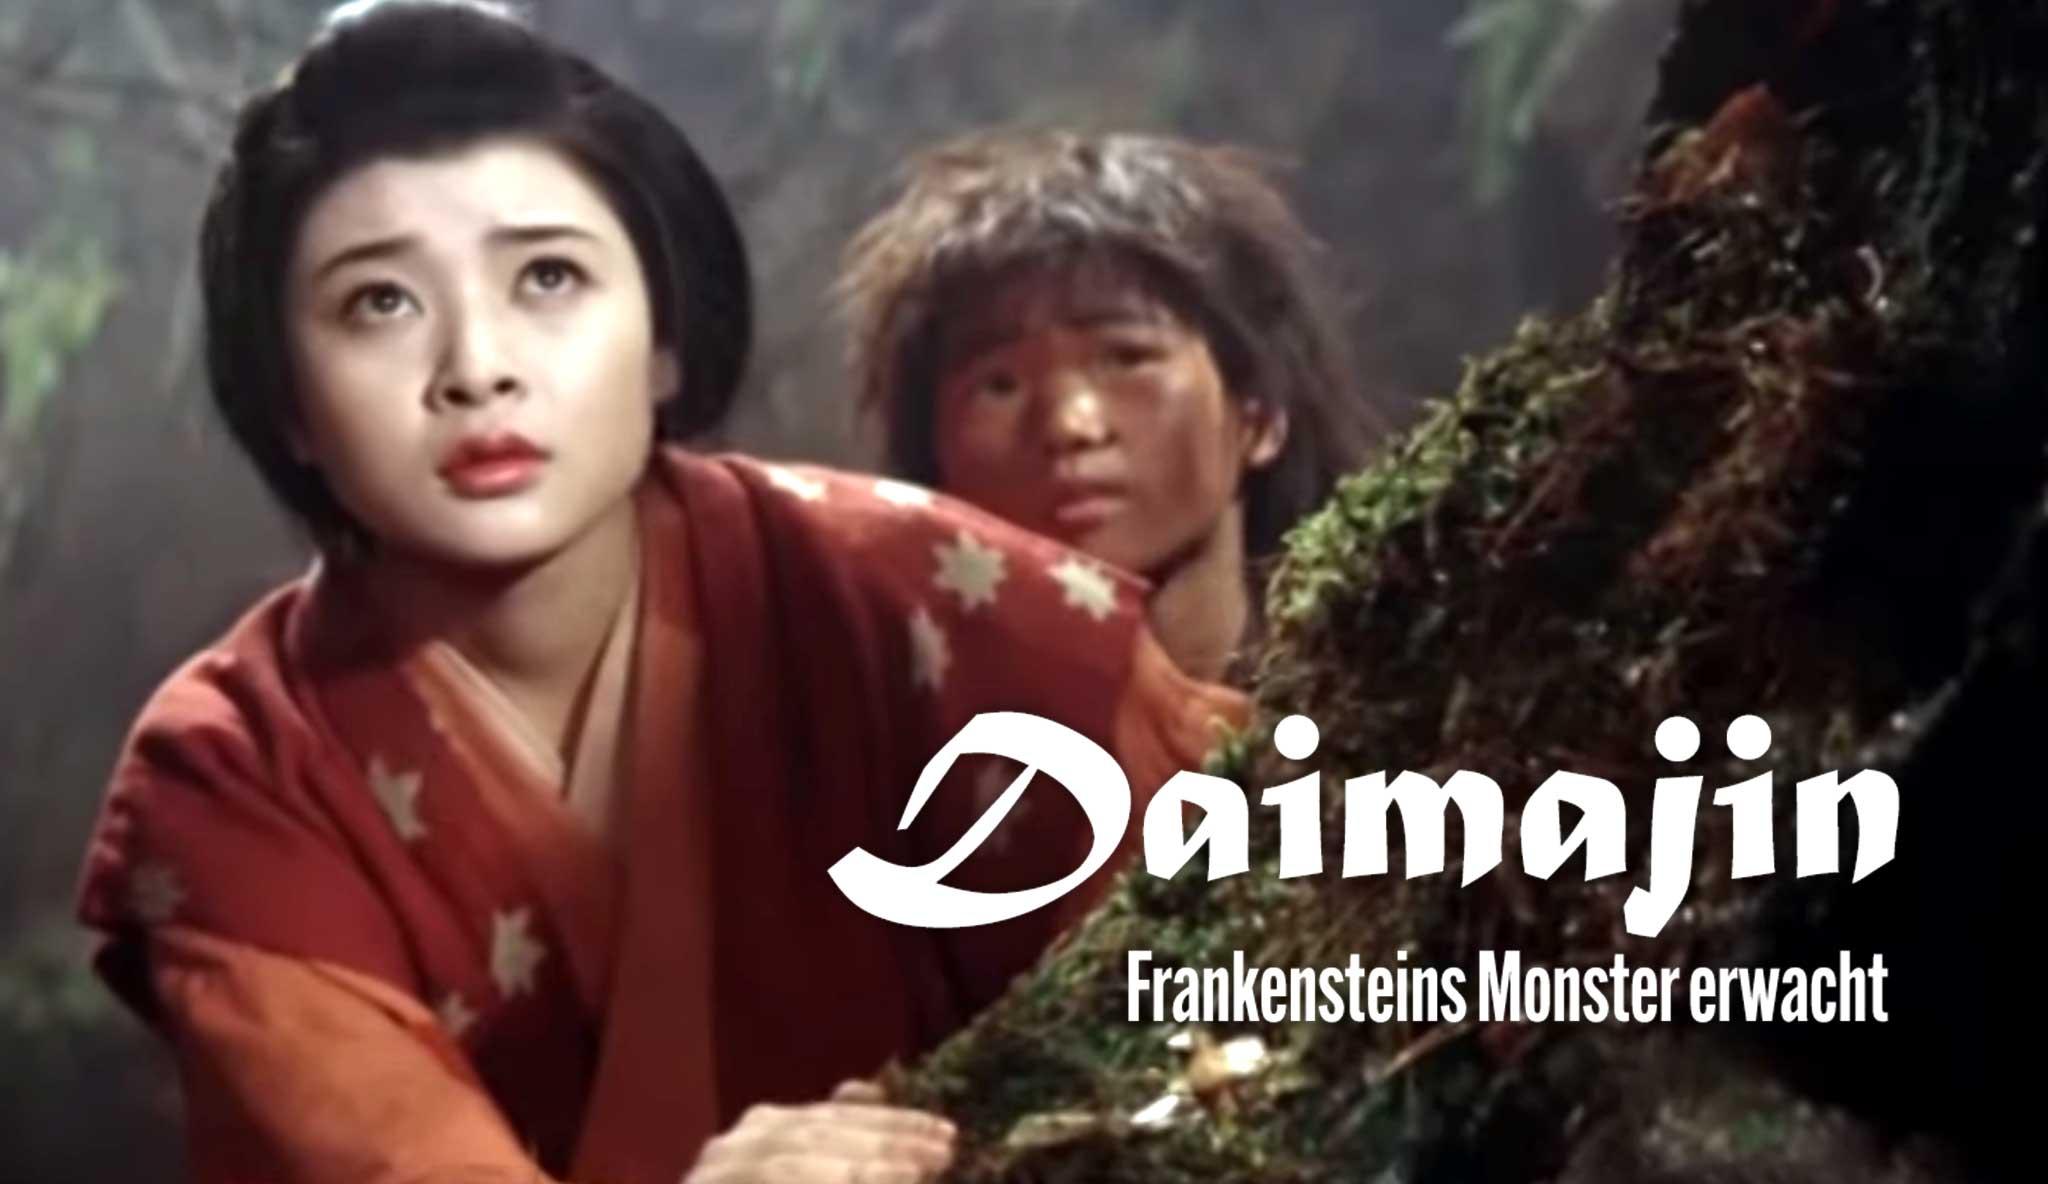 daimajin-frankensteins-monster-erwacht\header.jpg